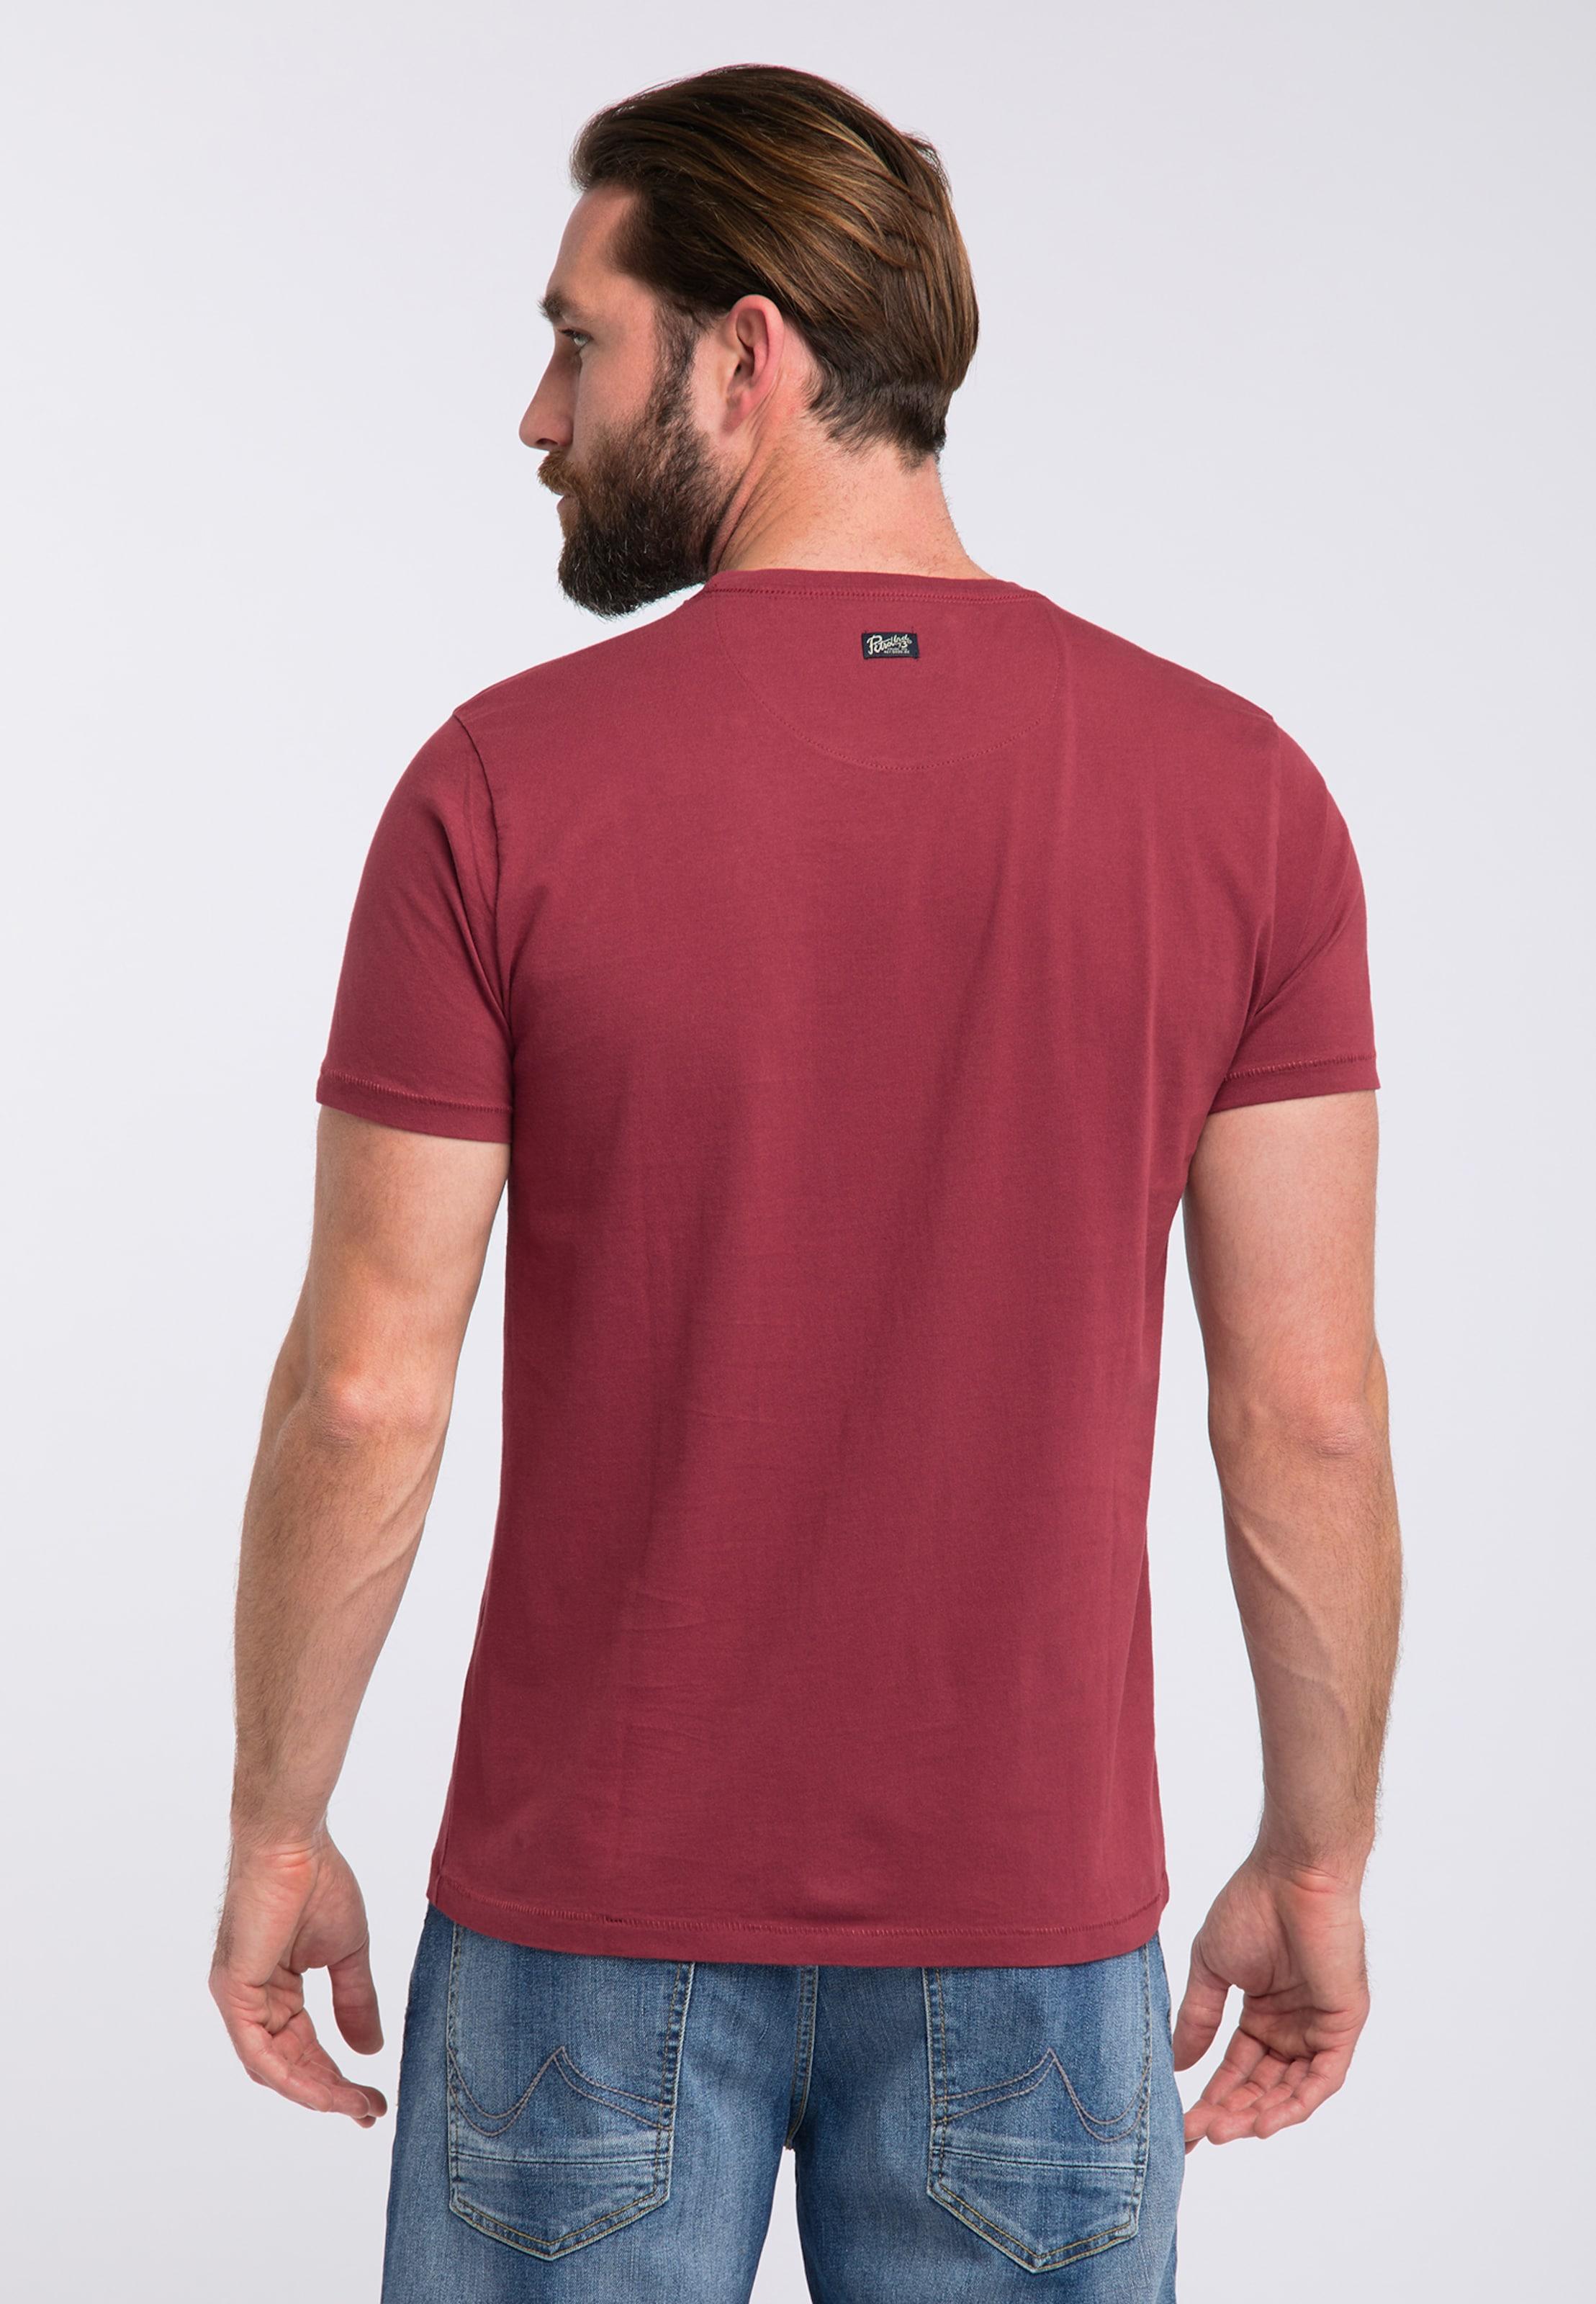 Industries En shirt Petrol T BleuRouge cqAL3Rj54